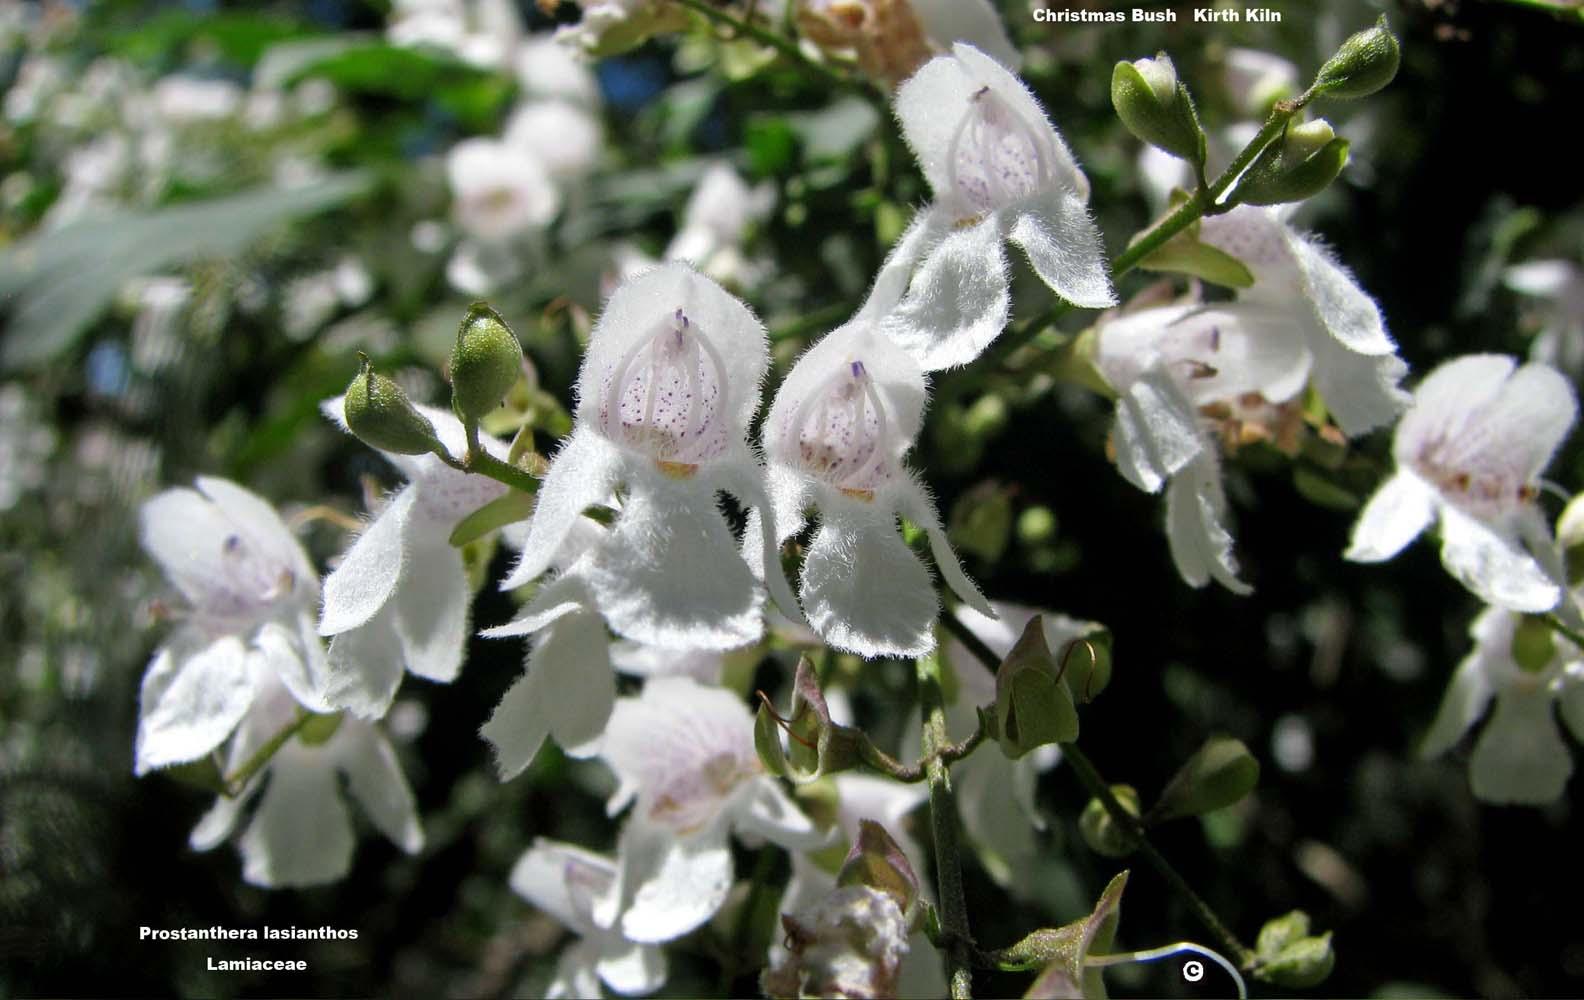 Prostanthera lasianthos flora ALA source